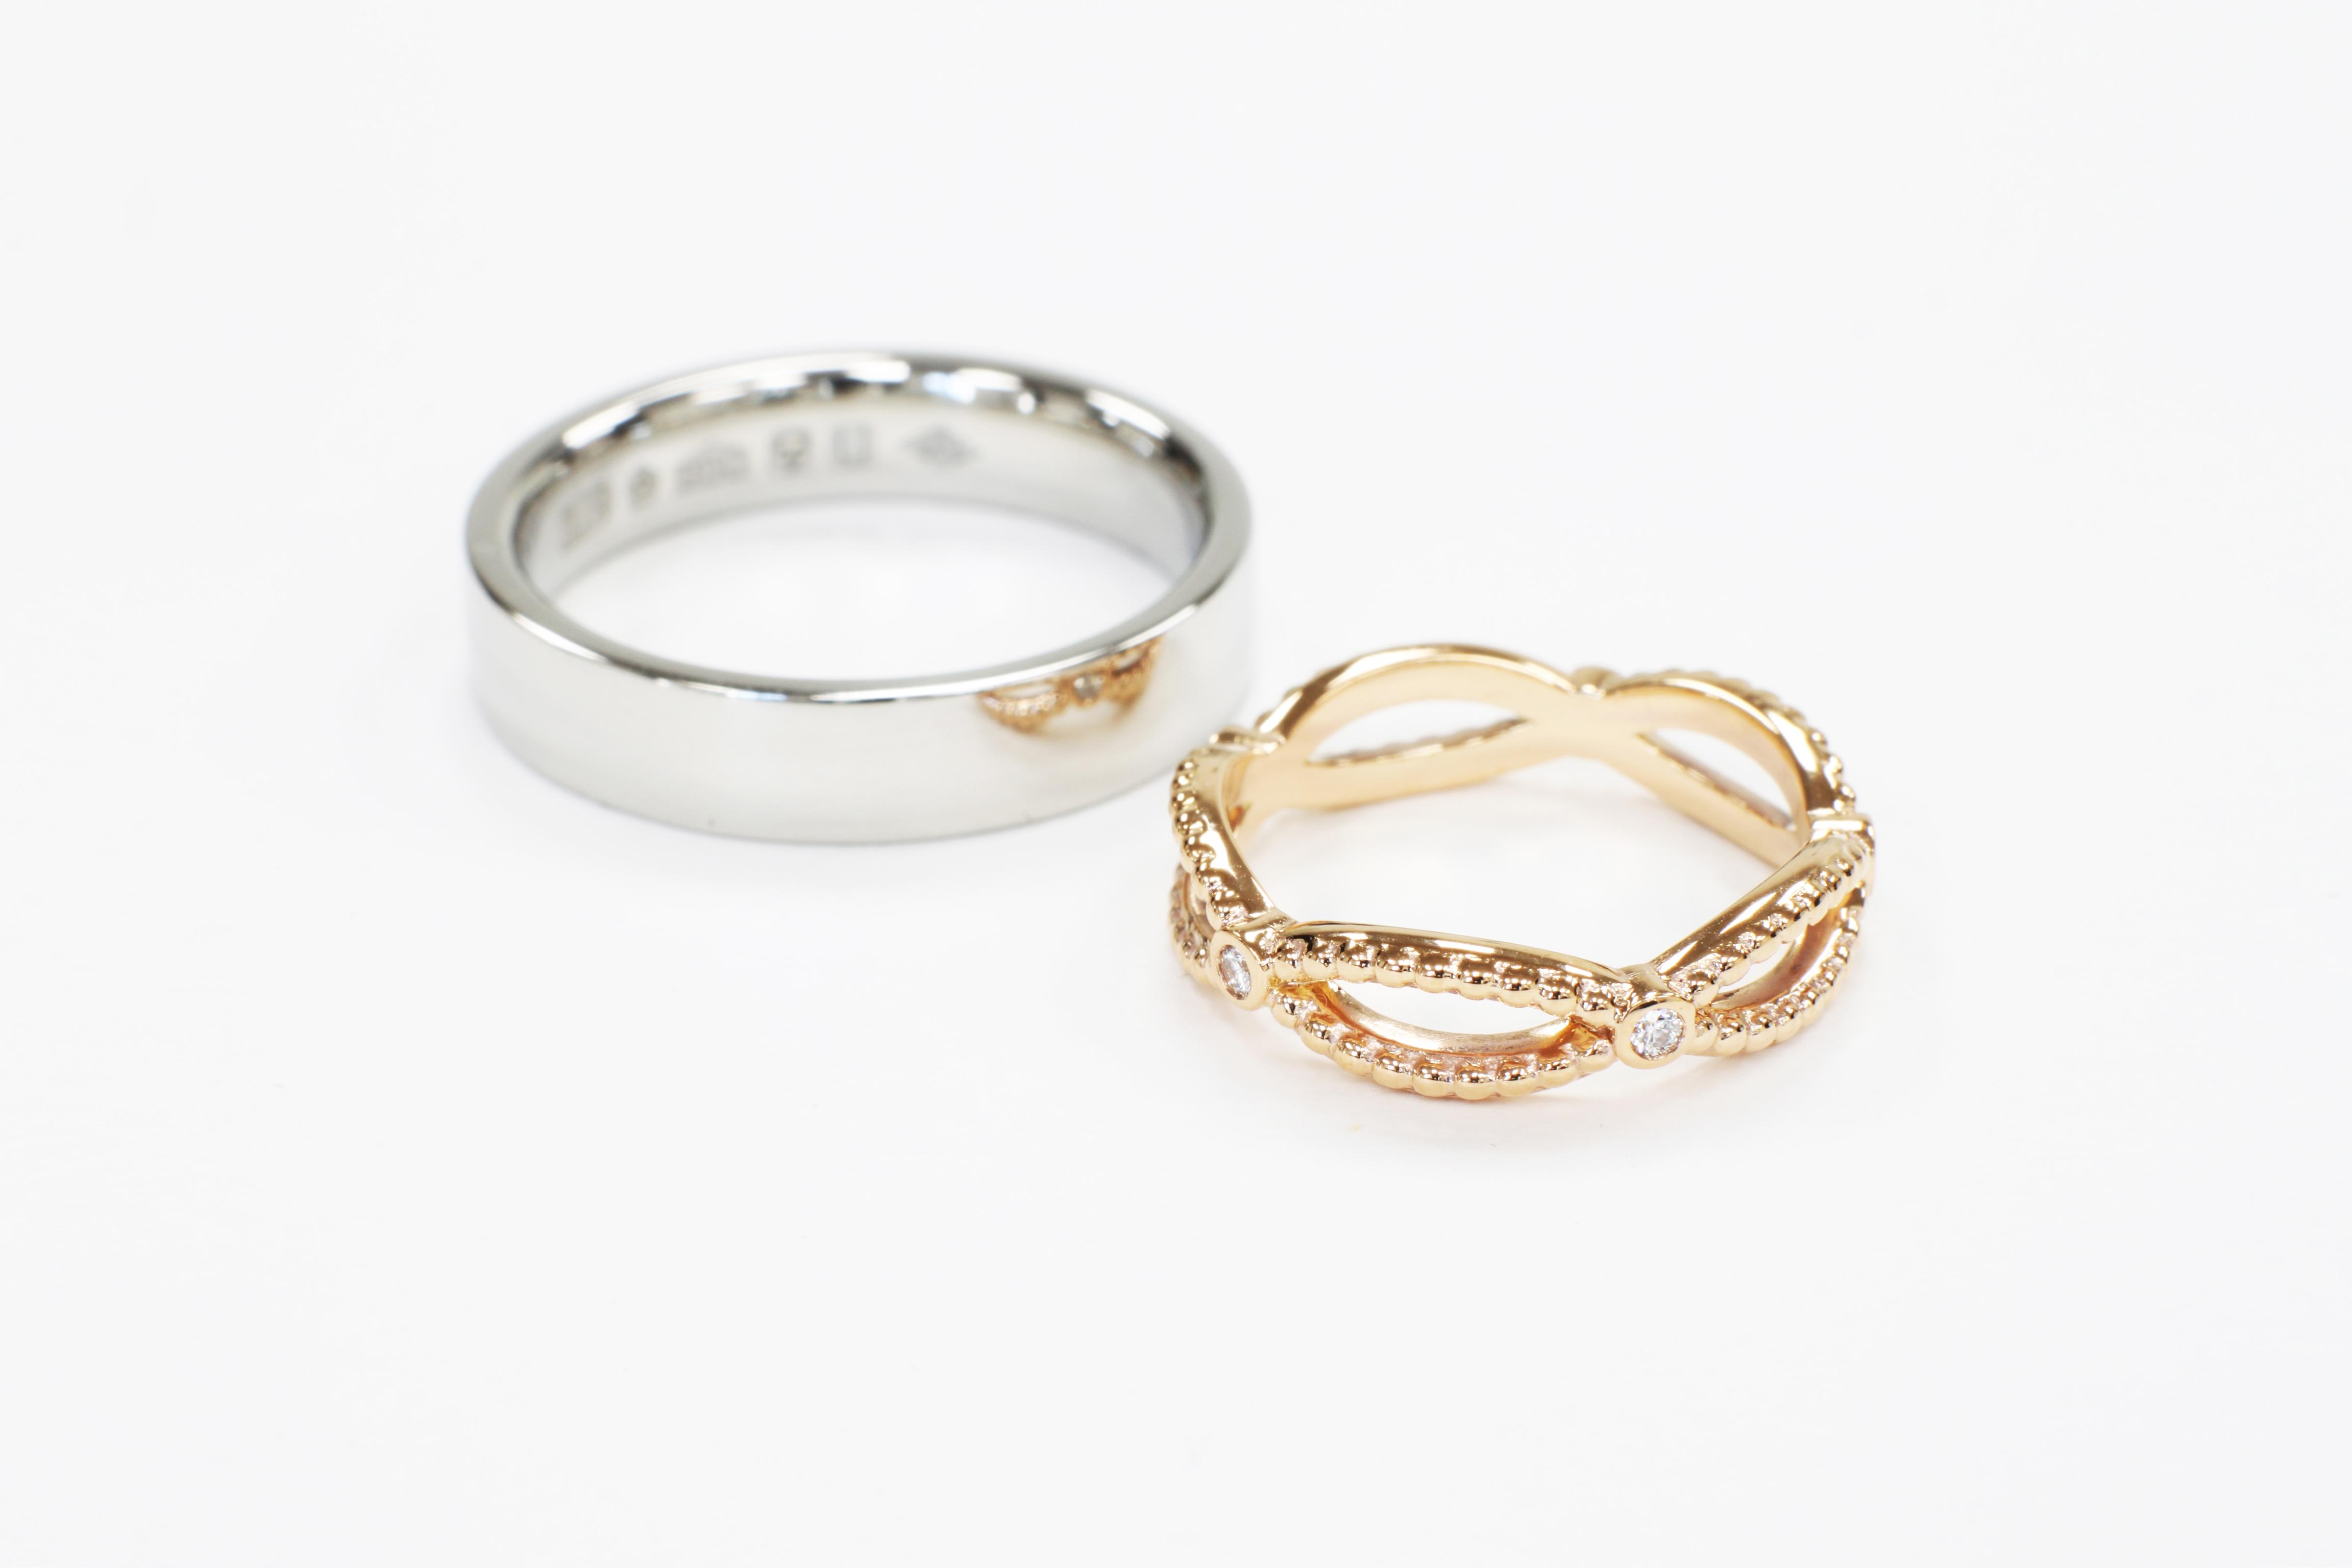 Wedding Ring 2 – Copyright BJRdesigns